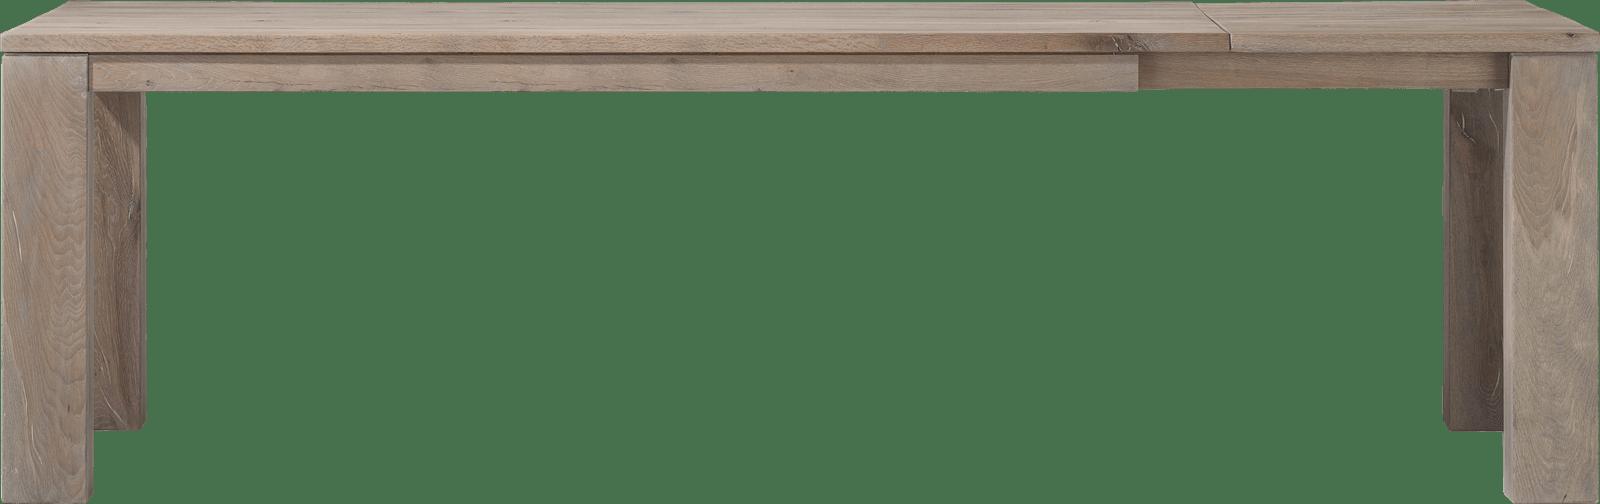 Masters - uitschuiftafel 200 (+60) x 100 cm - hout 12x12/10x14